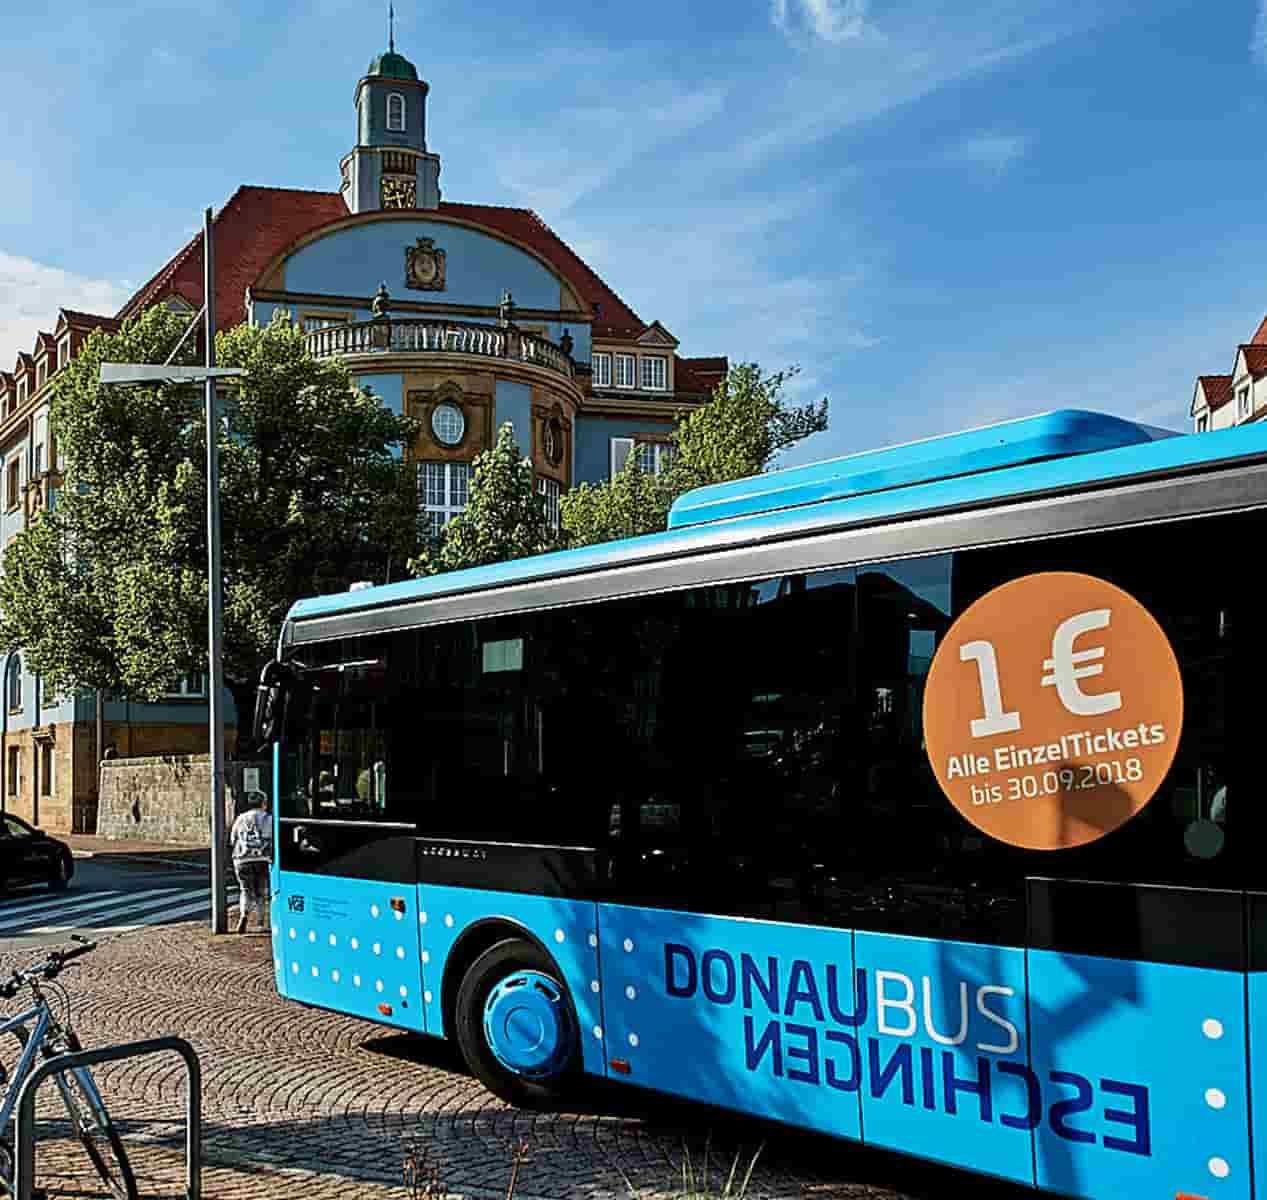 Donaubus am donaueschinger Rathausplatz